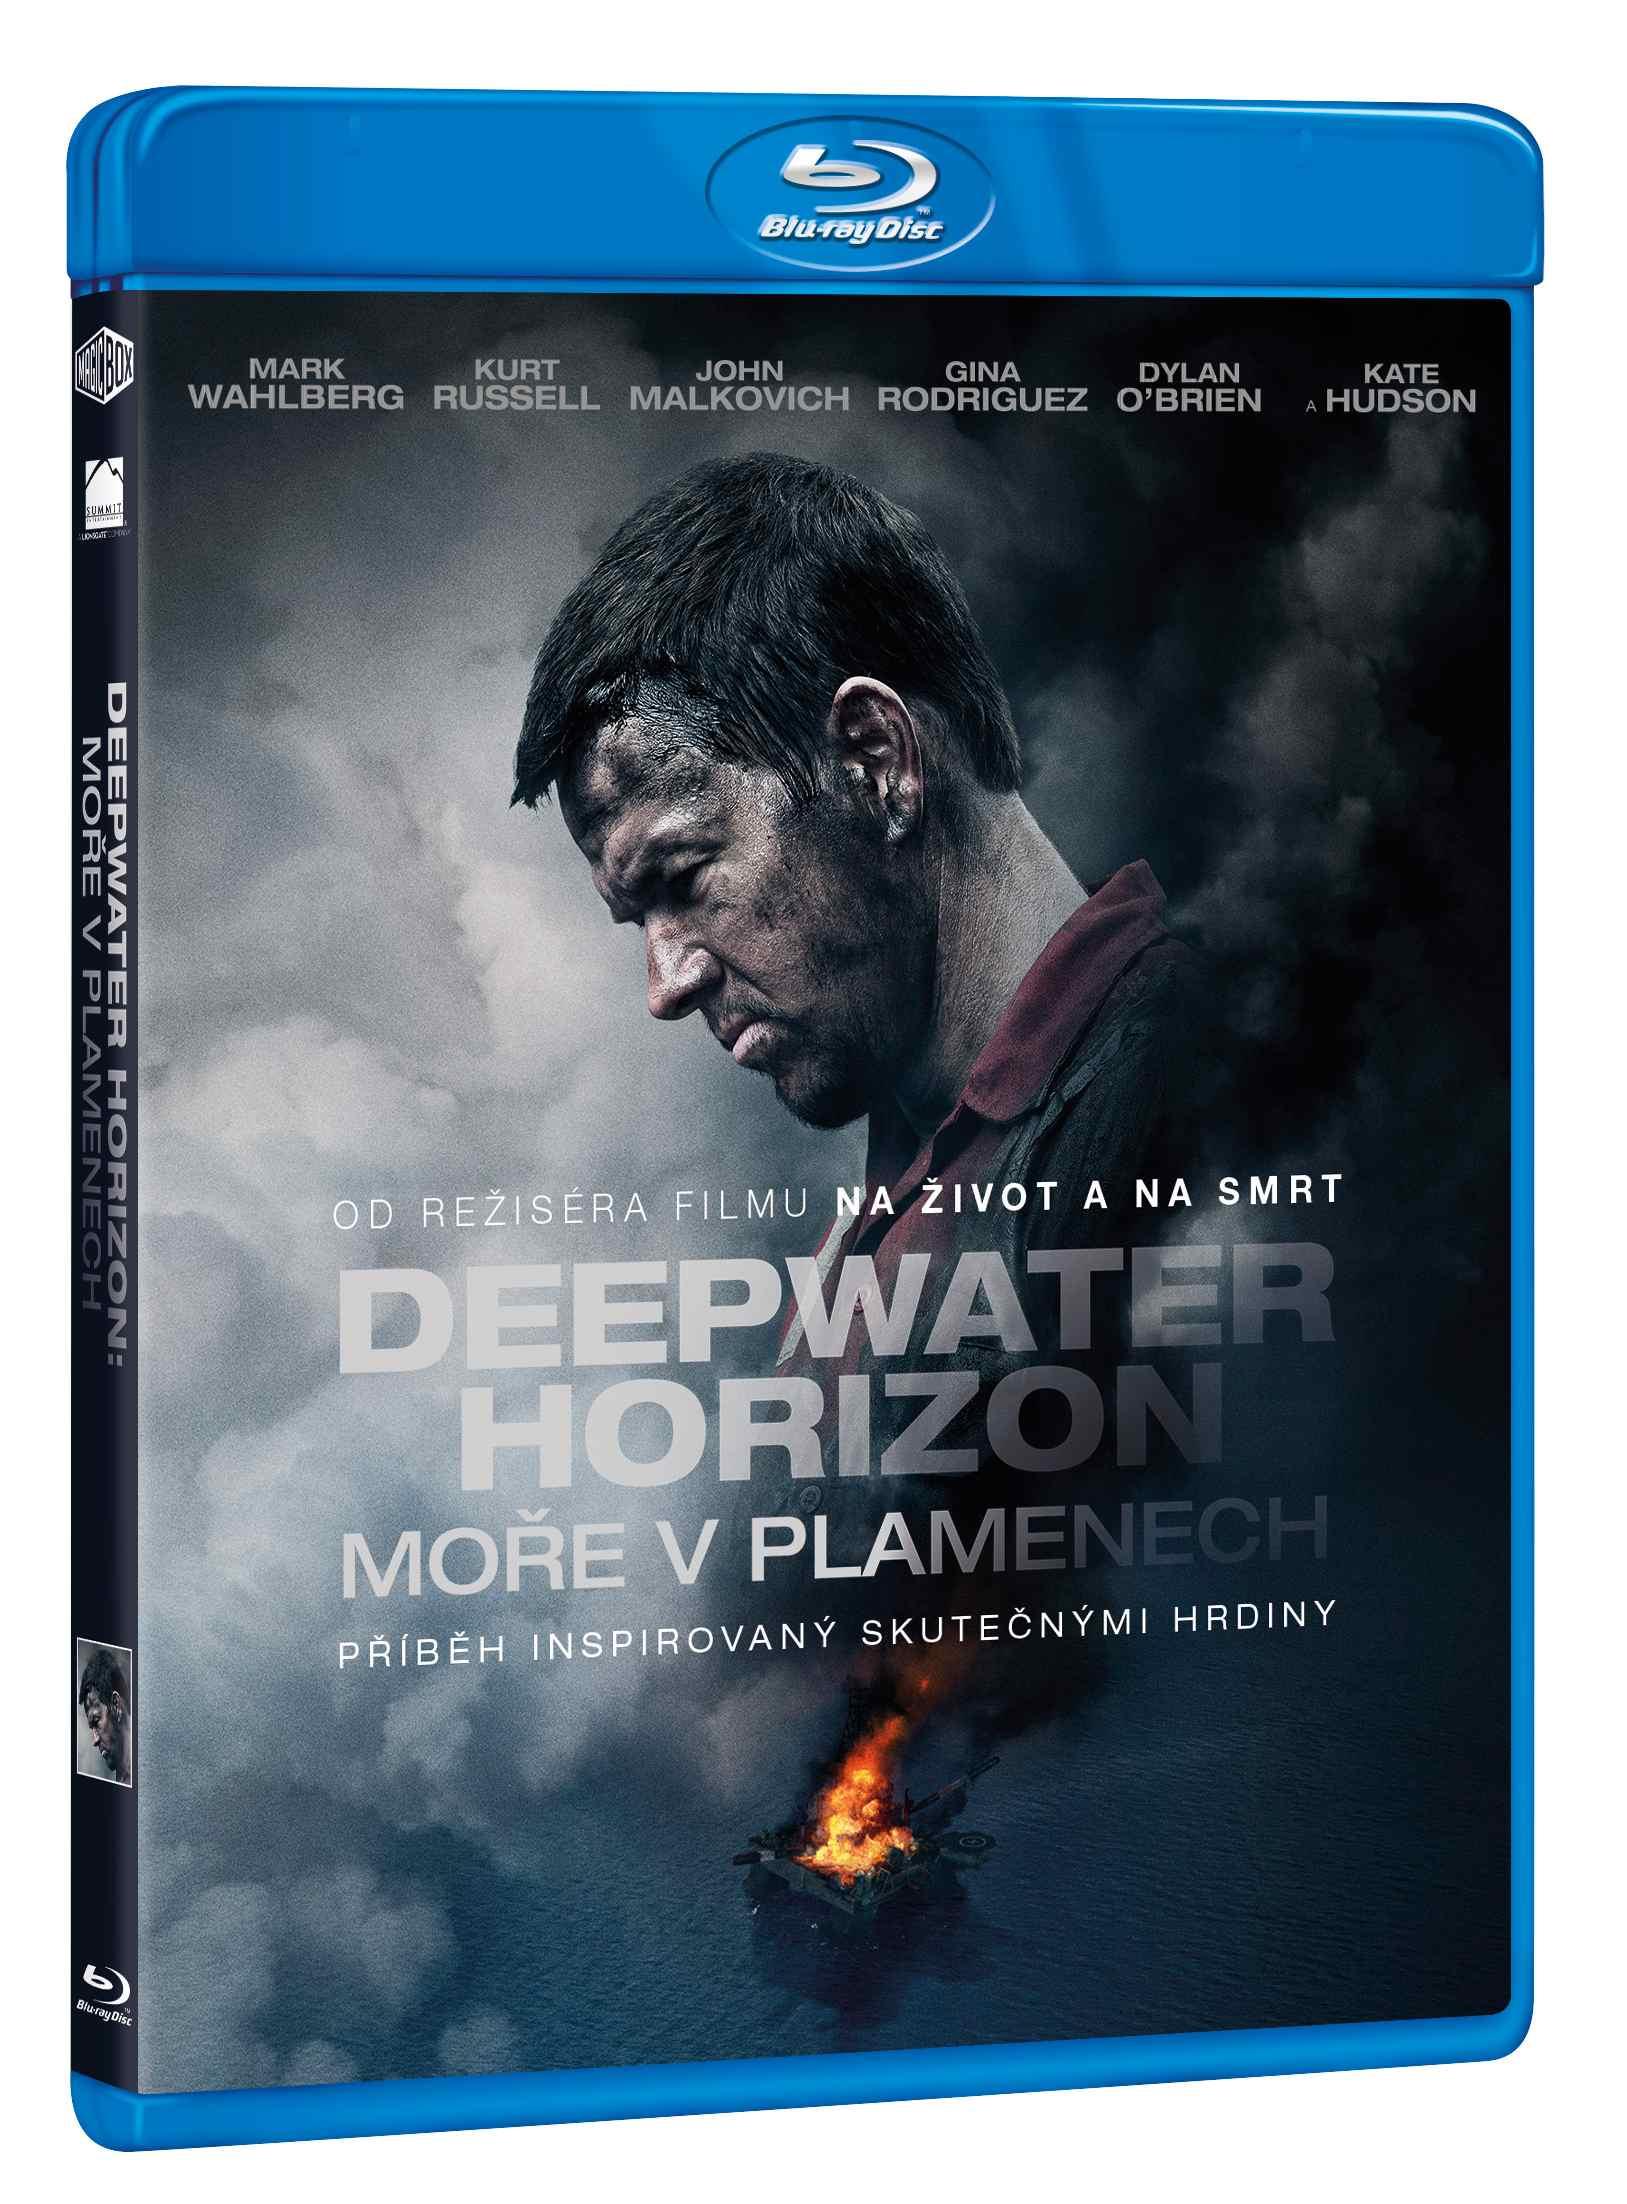 DEEPWATER HORIZON: MOŘE V PLAMENECH - Blu-ray